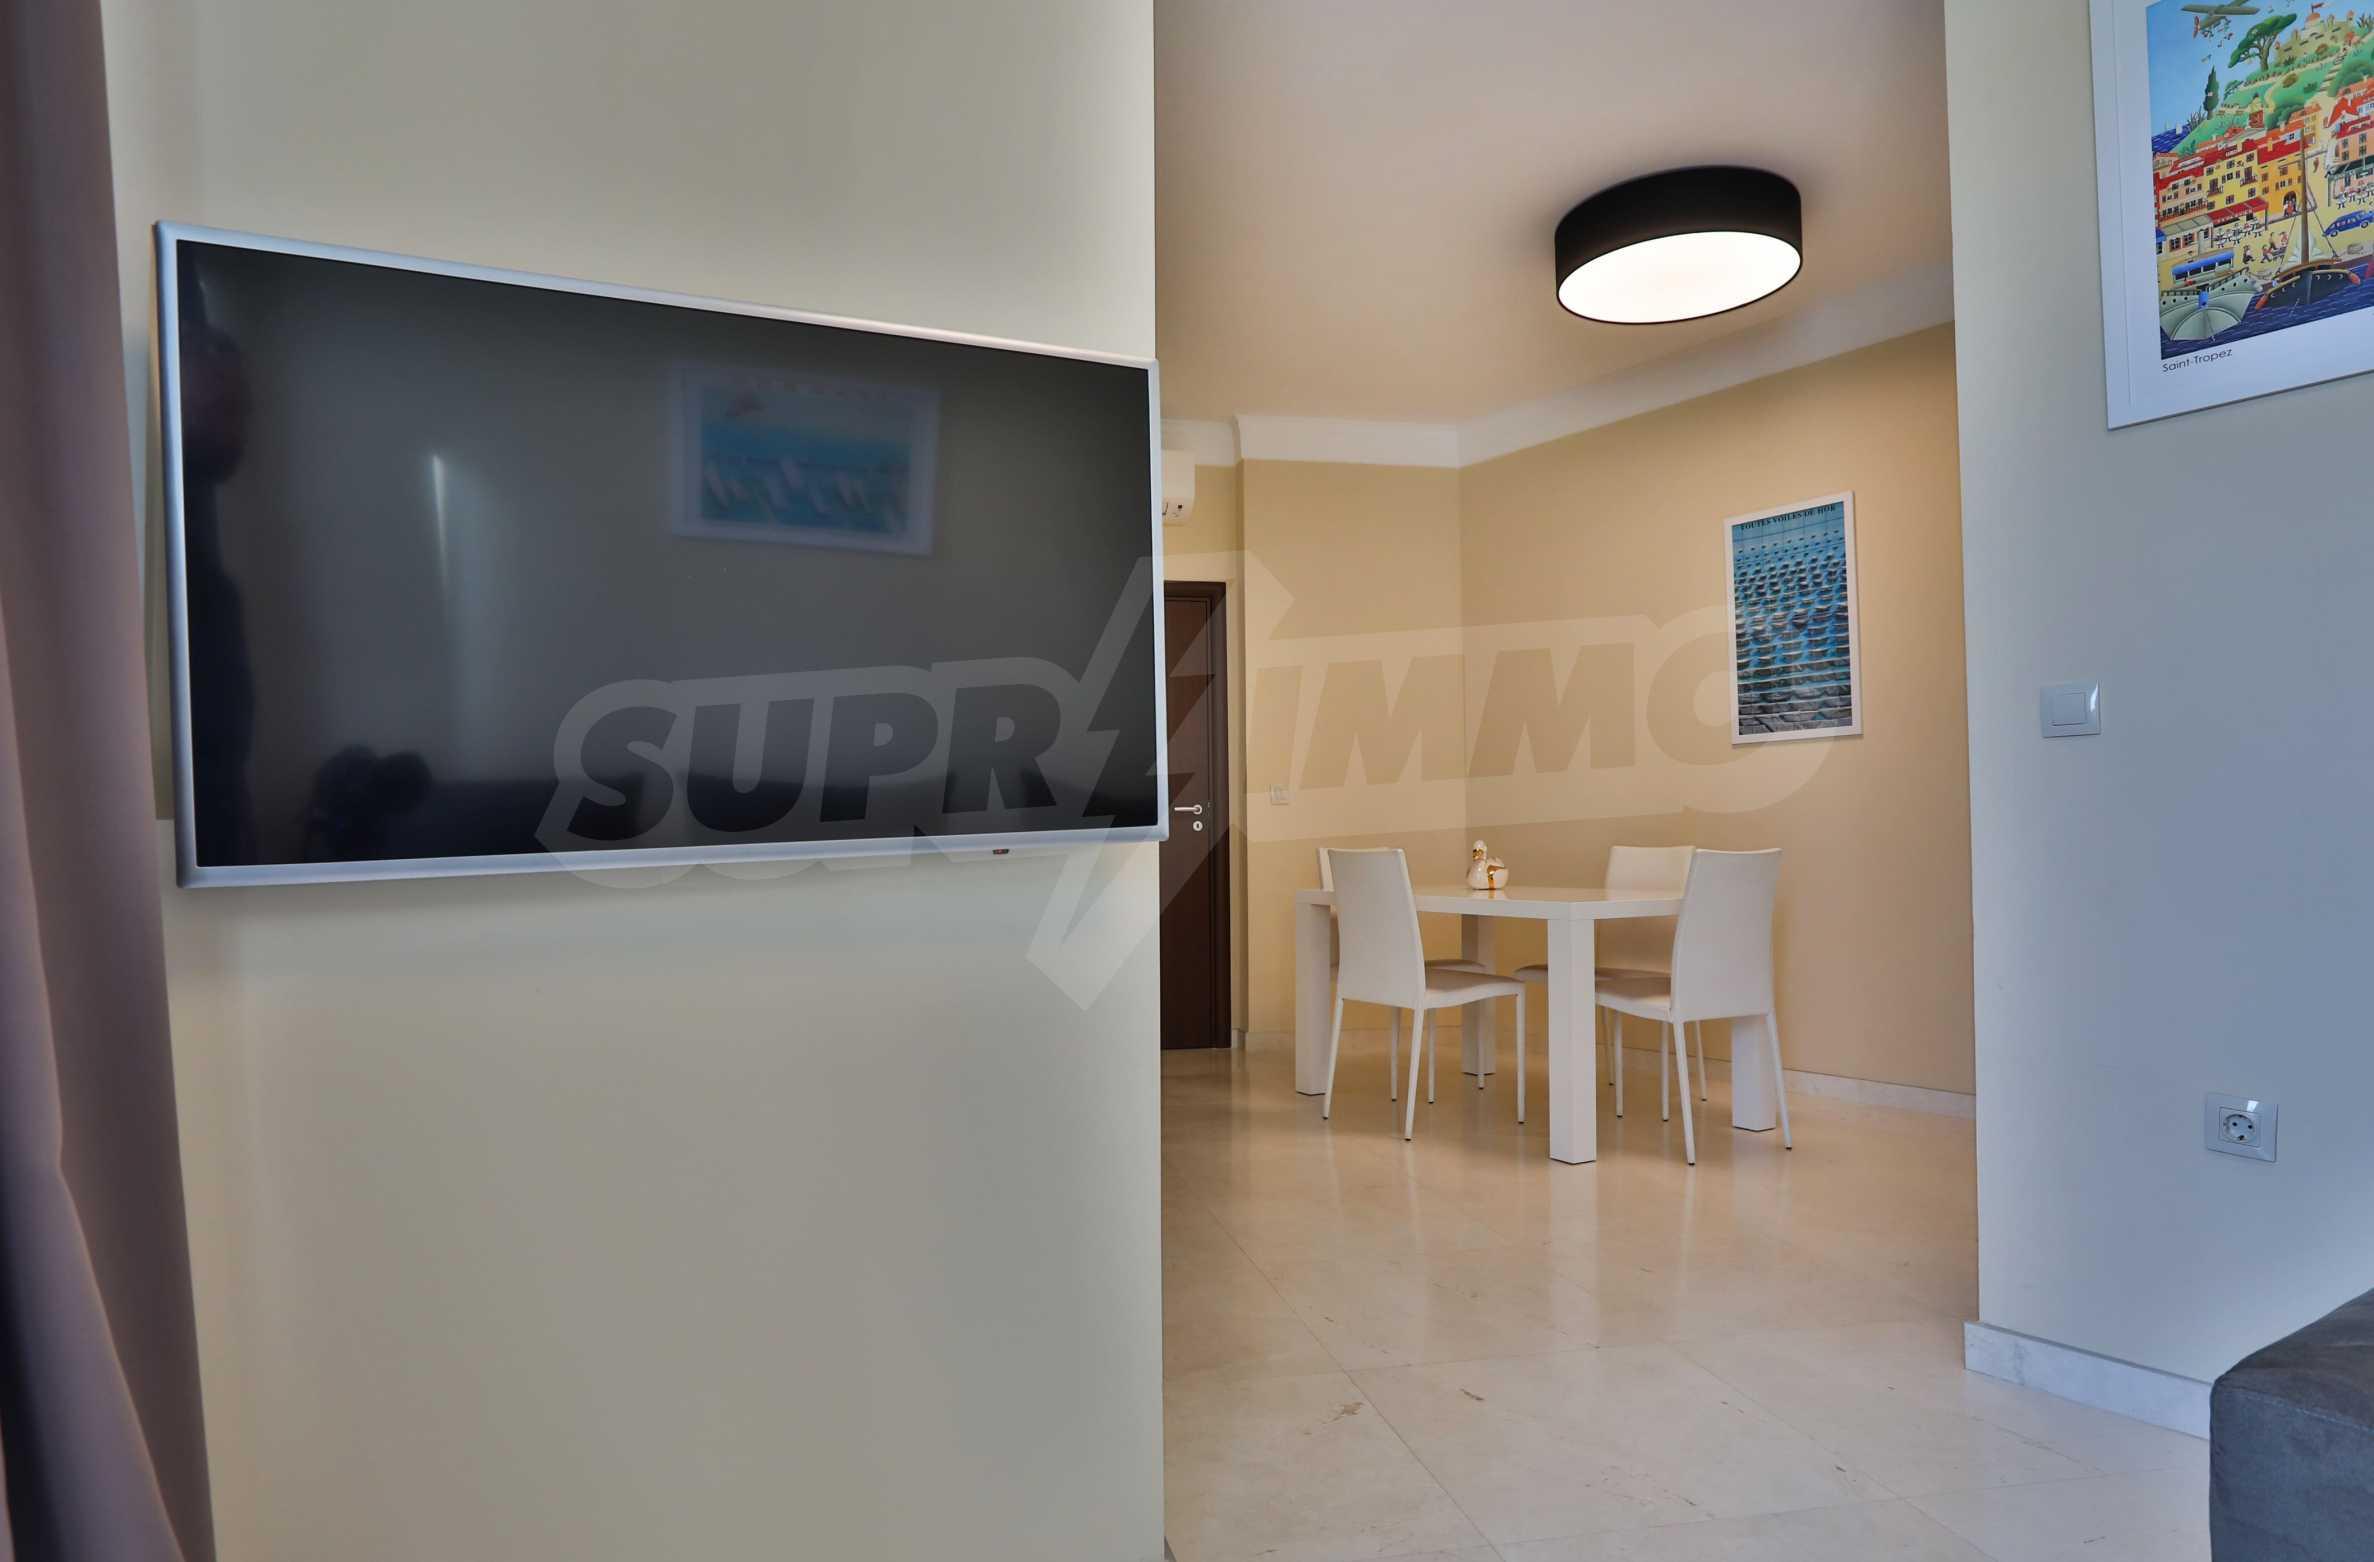 Дизайнерски тристаен апартамент под наем за летен сезон в резиденция Belle Époque в Лозенец 6